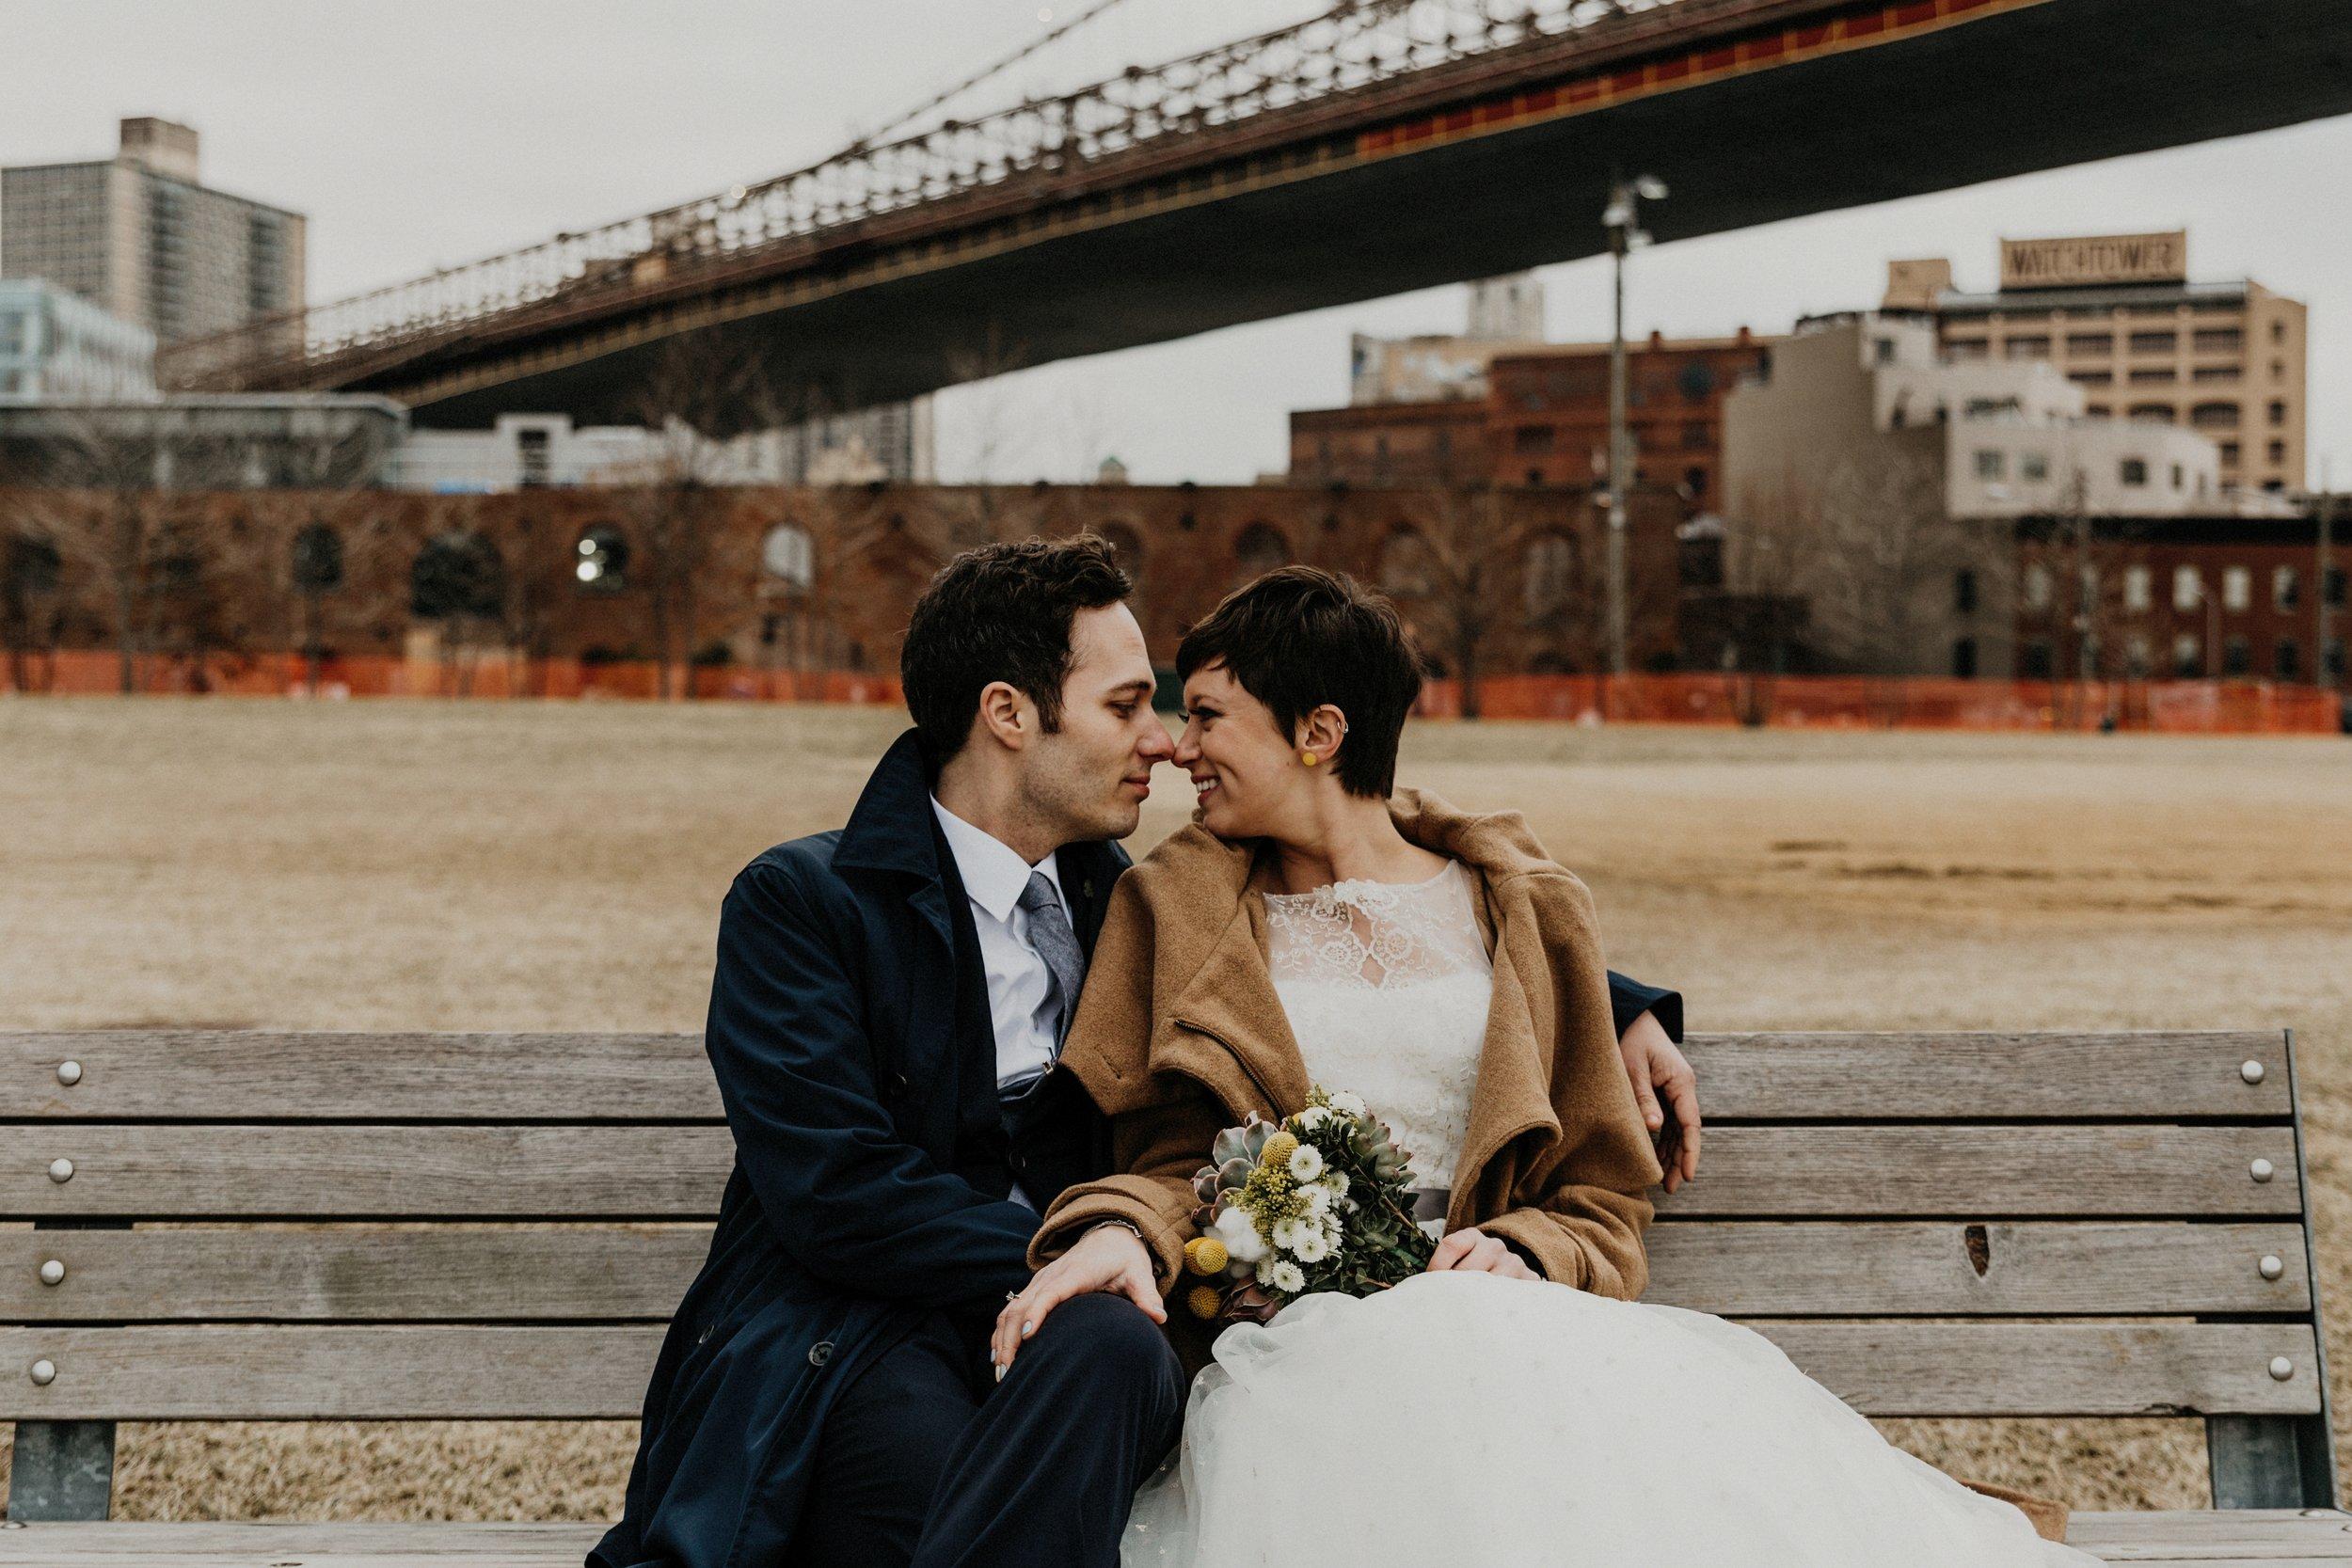 Philip + Ashley | NYC Wedding